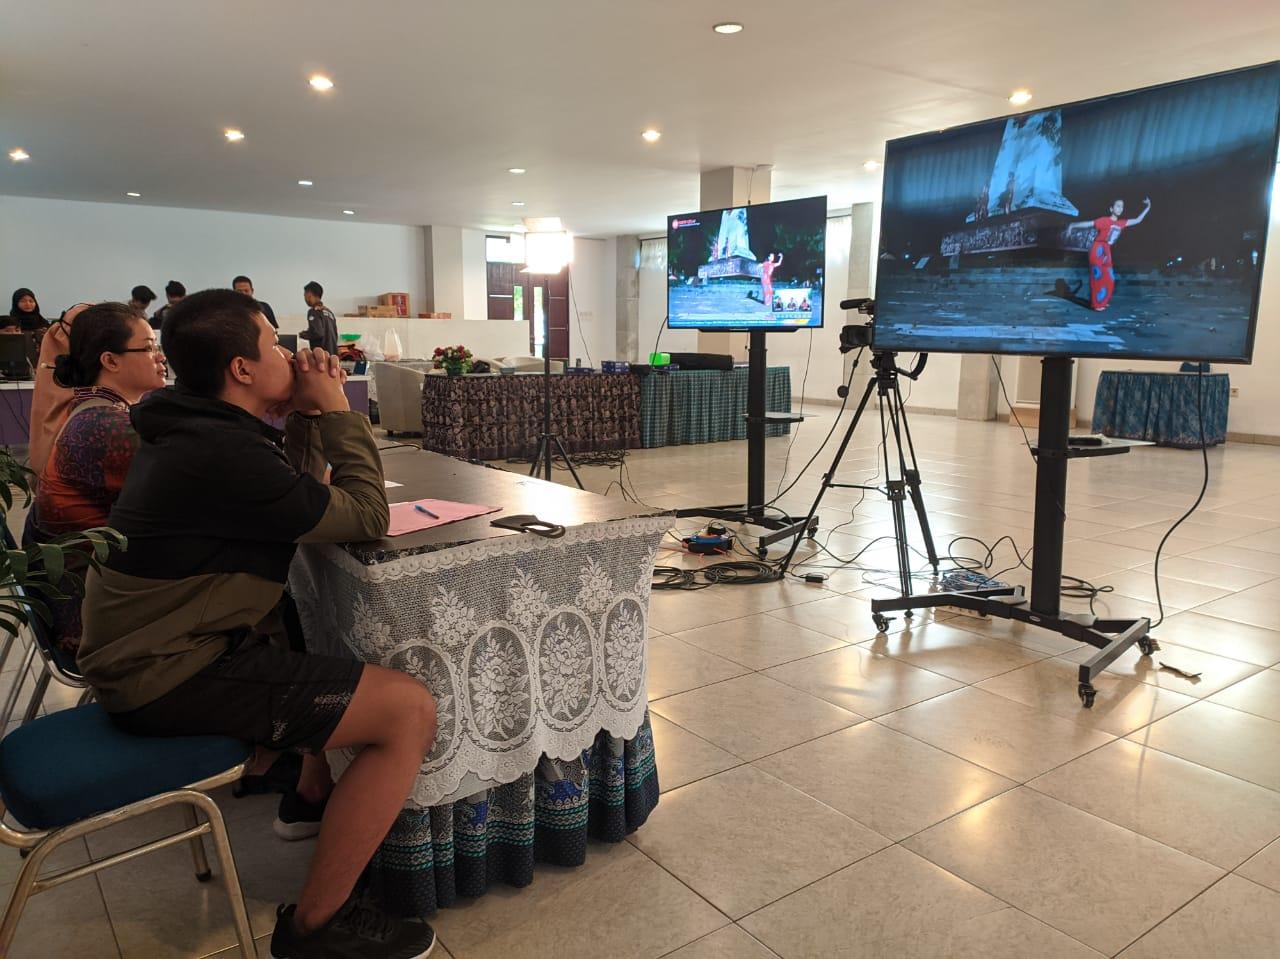 Antusias Pelajar Ikuti Lomba Tari Virtual